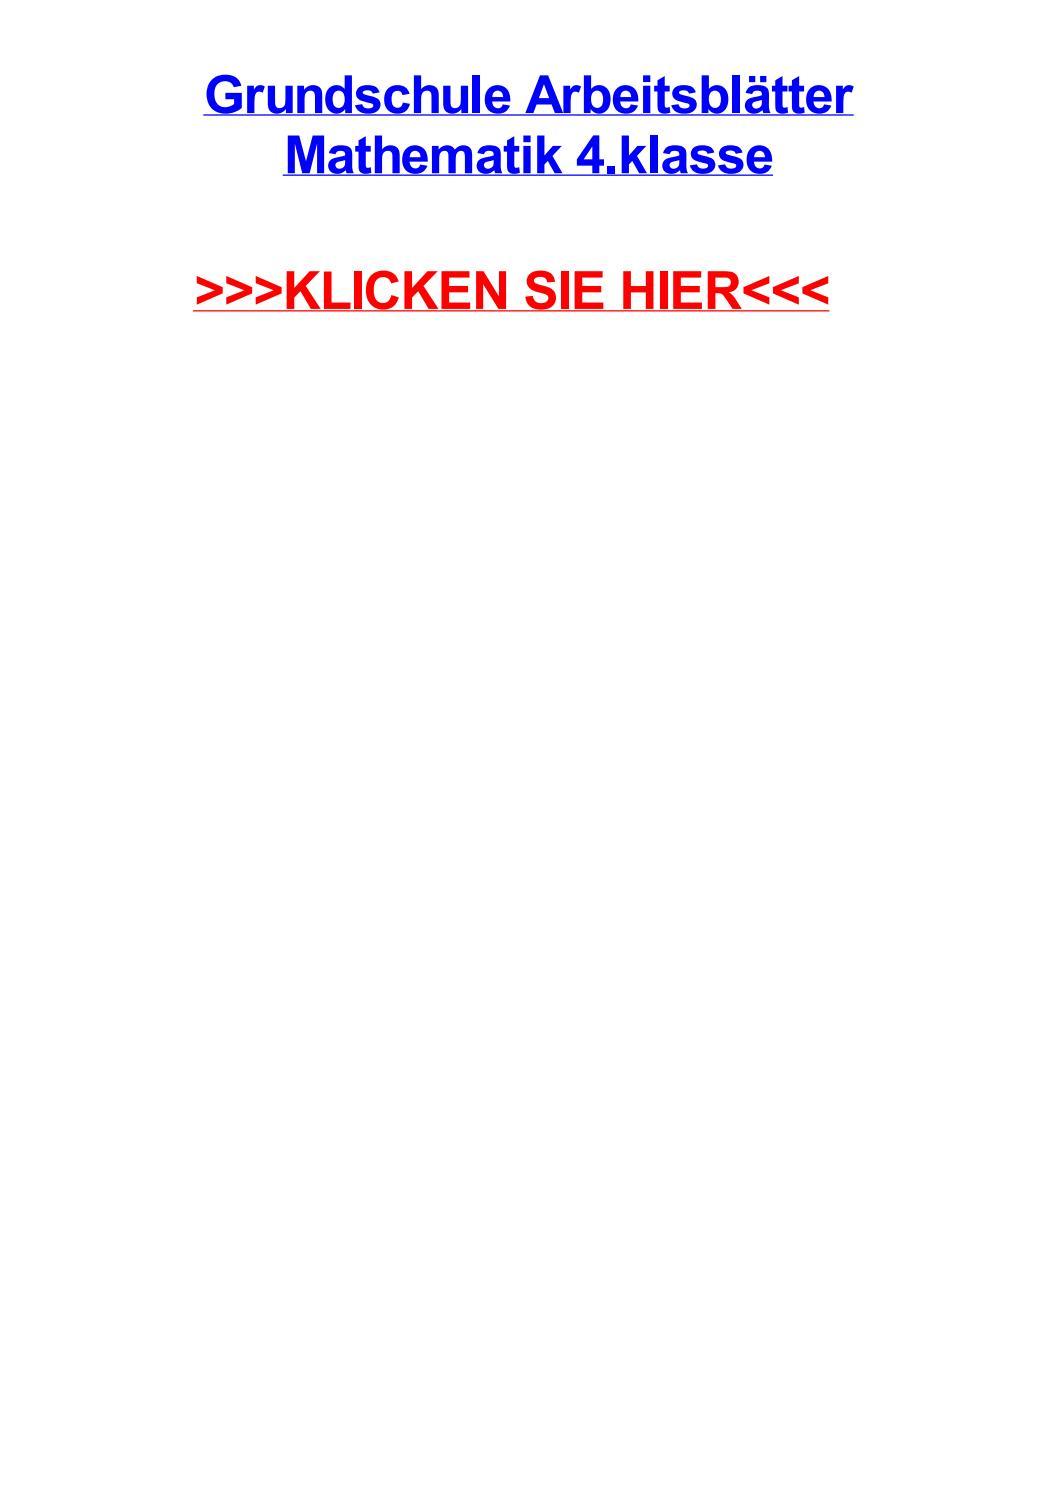 Grundschule arbeitsbltter mathematik 4 klasse by danhmqmh - issuu